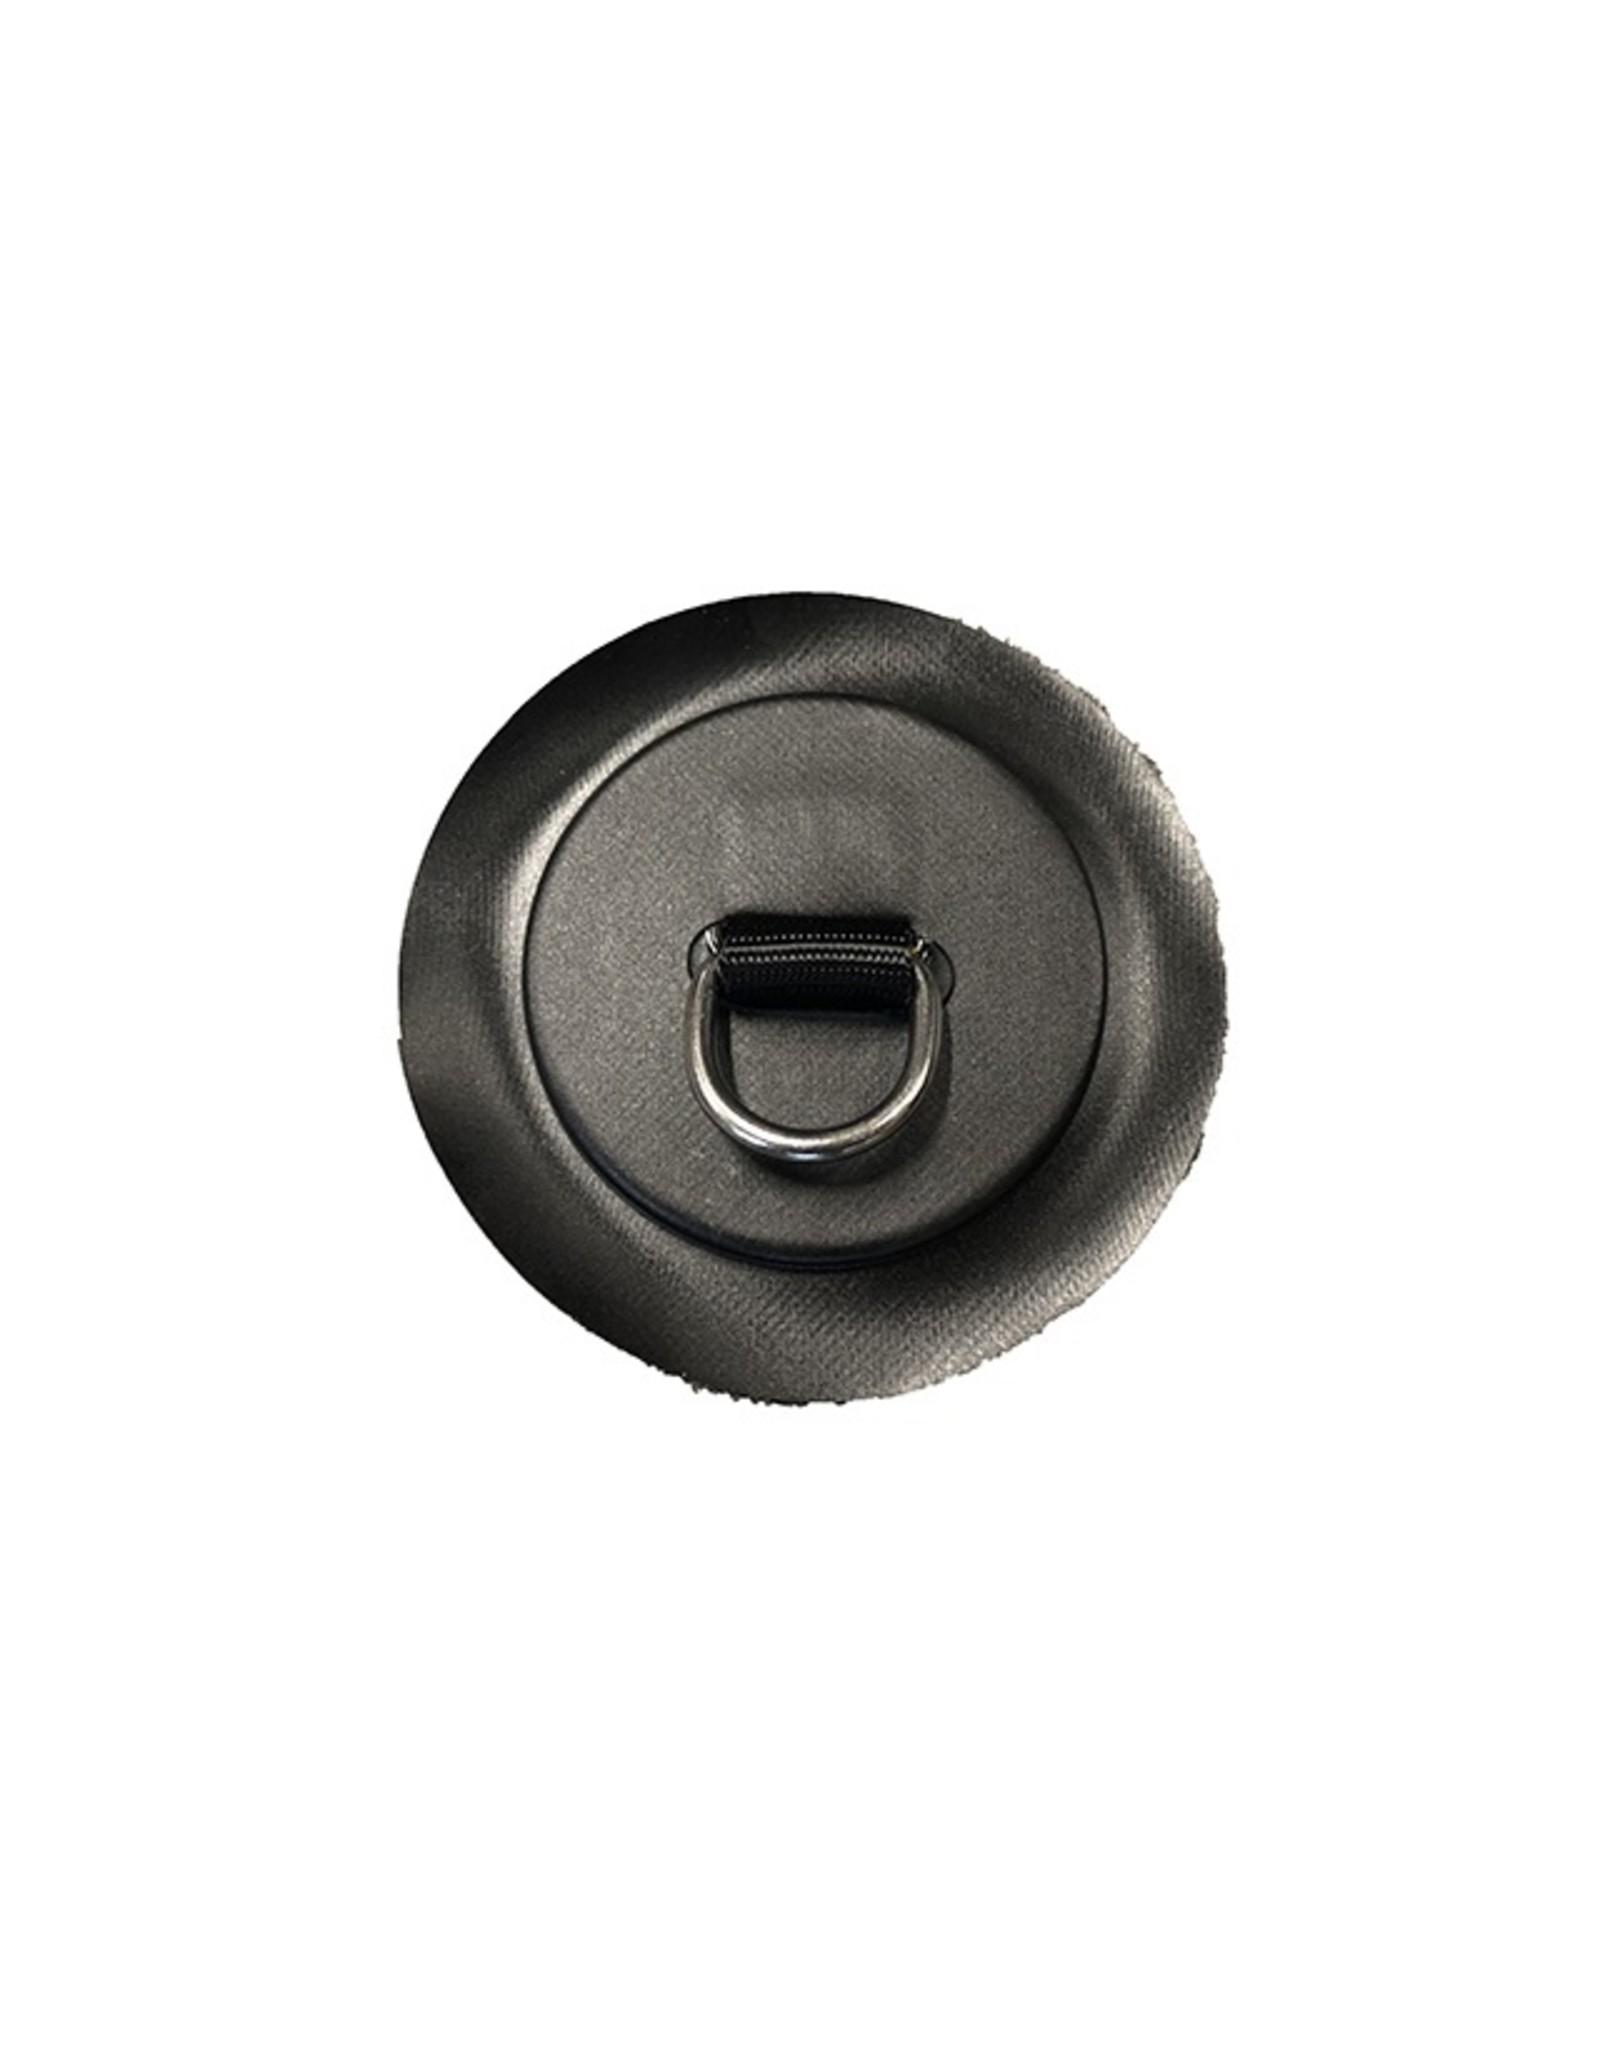 Valiant Valiant D-ring PVC zwart 115mm